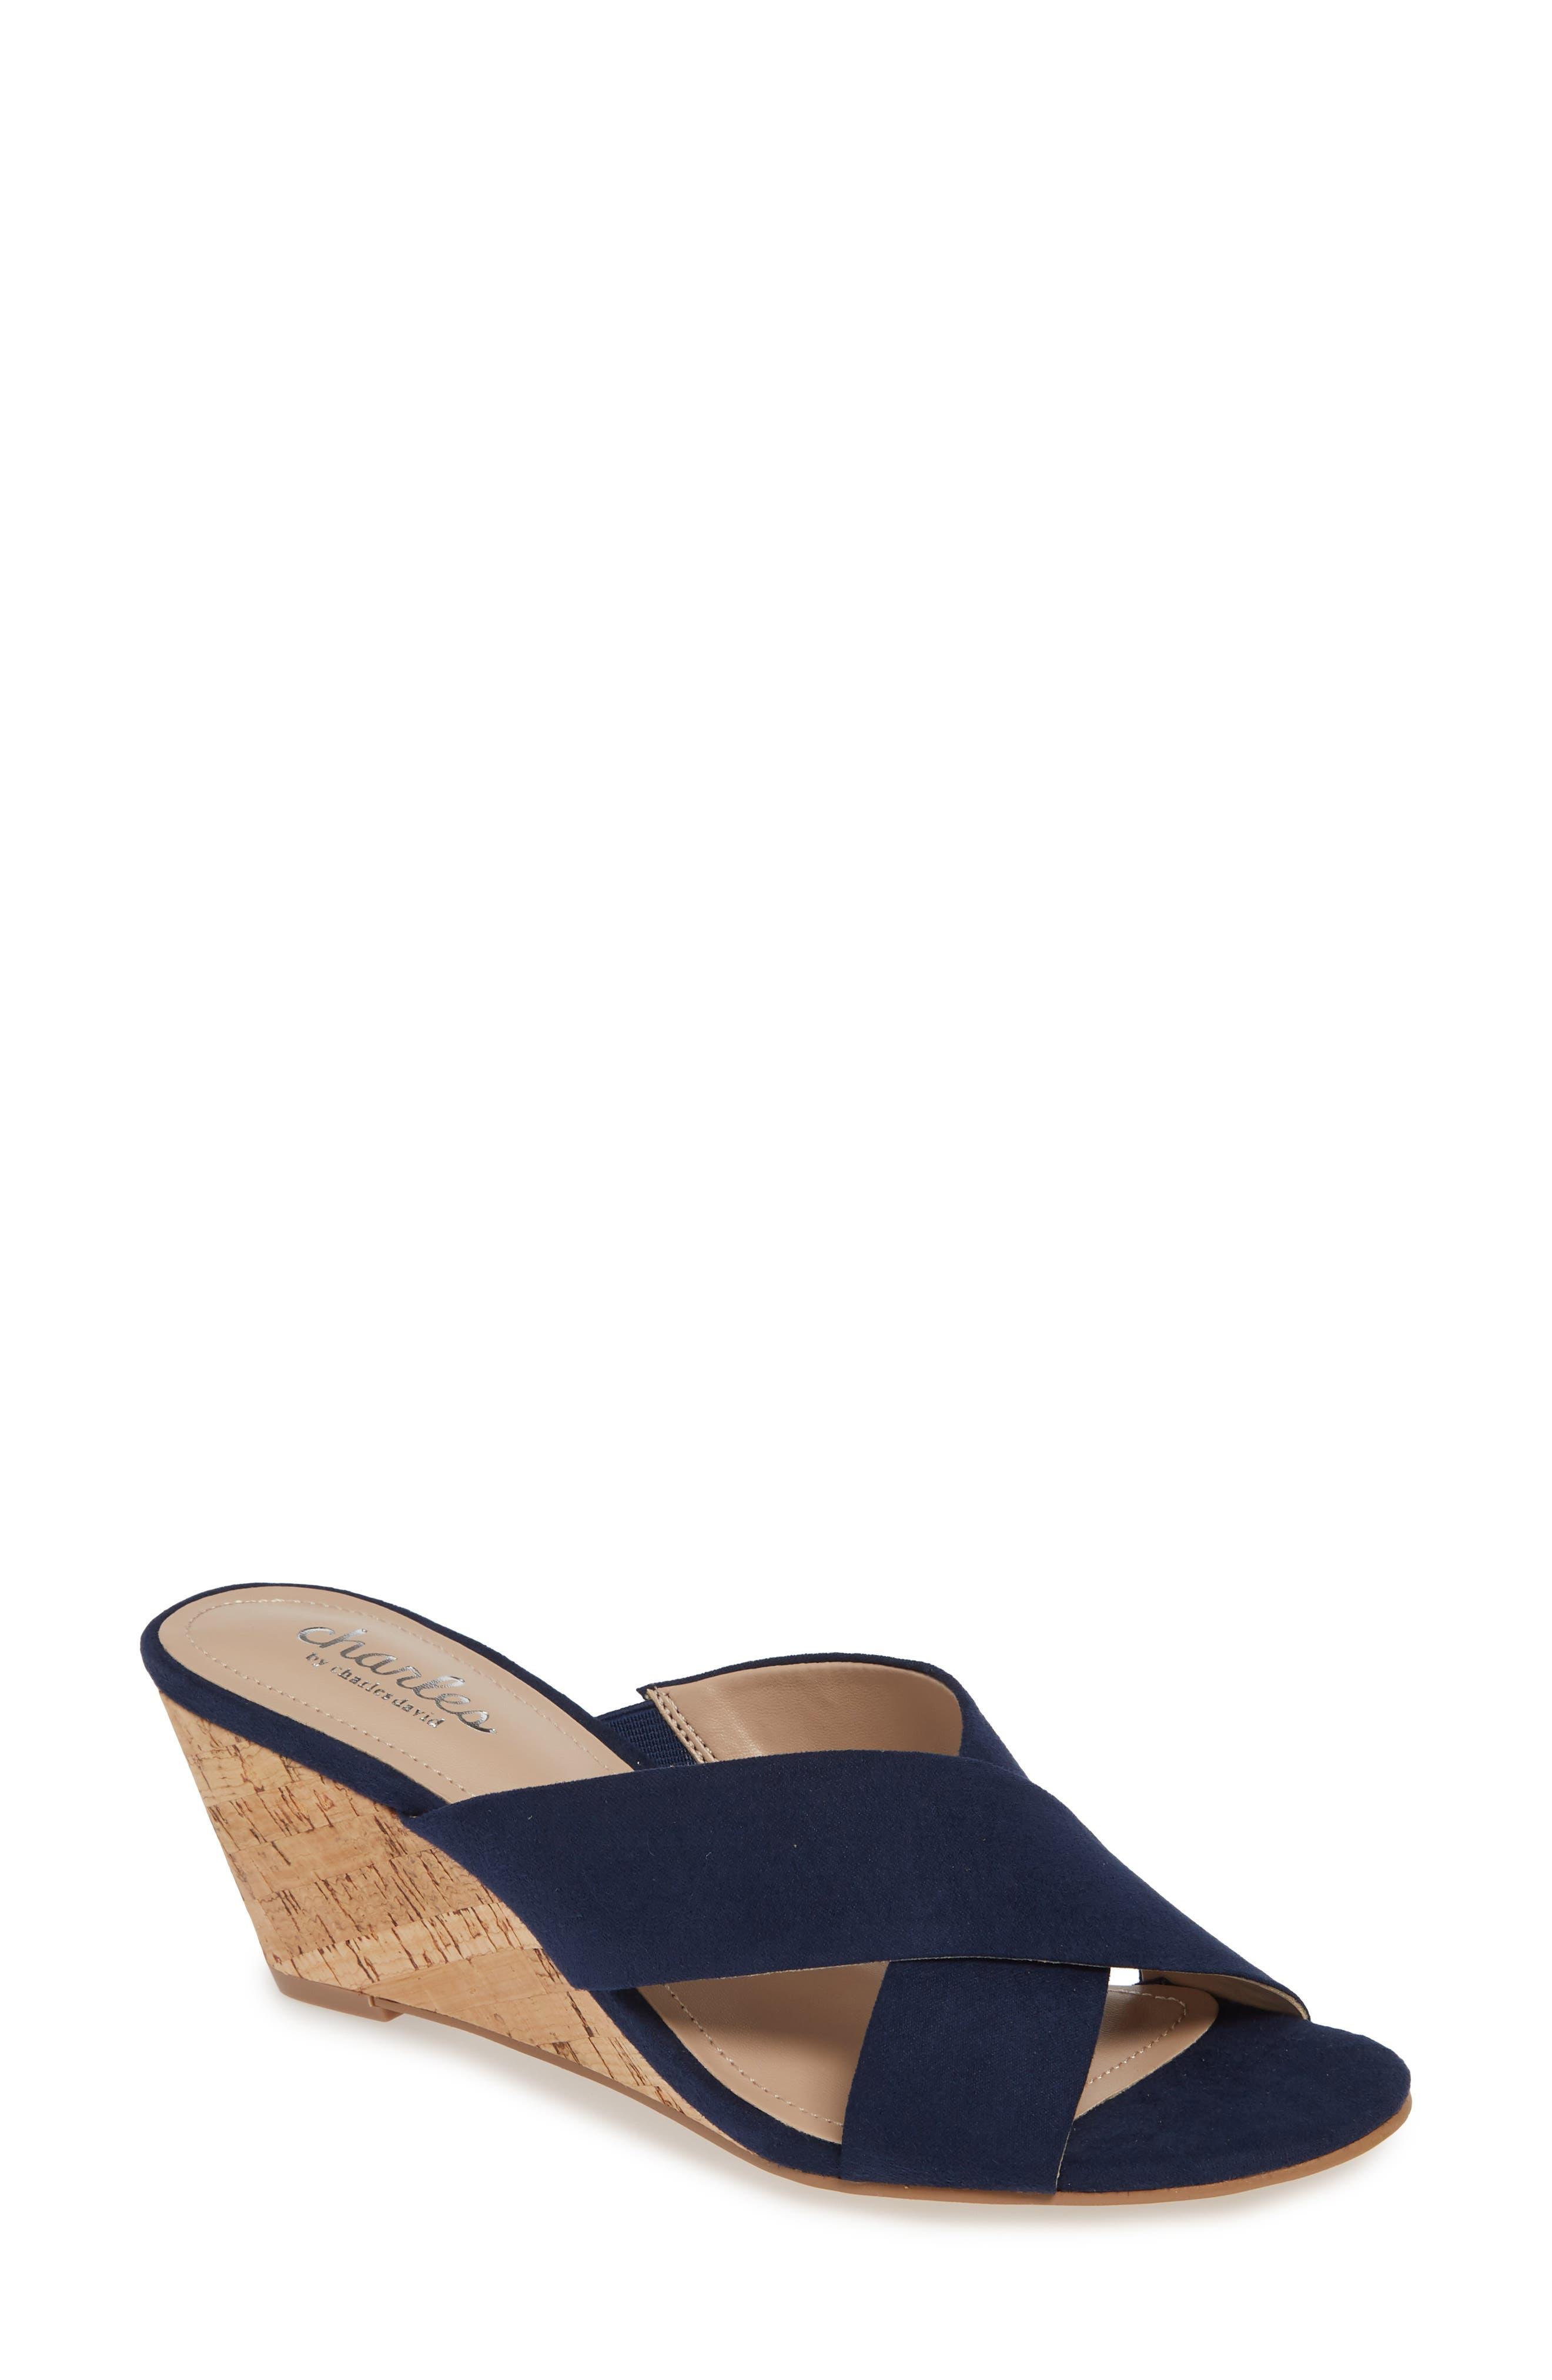 Charles By Charles David Grady Slide Sandal, Blue